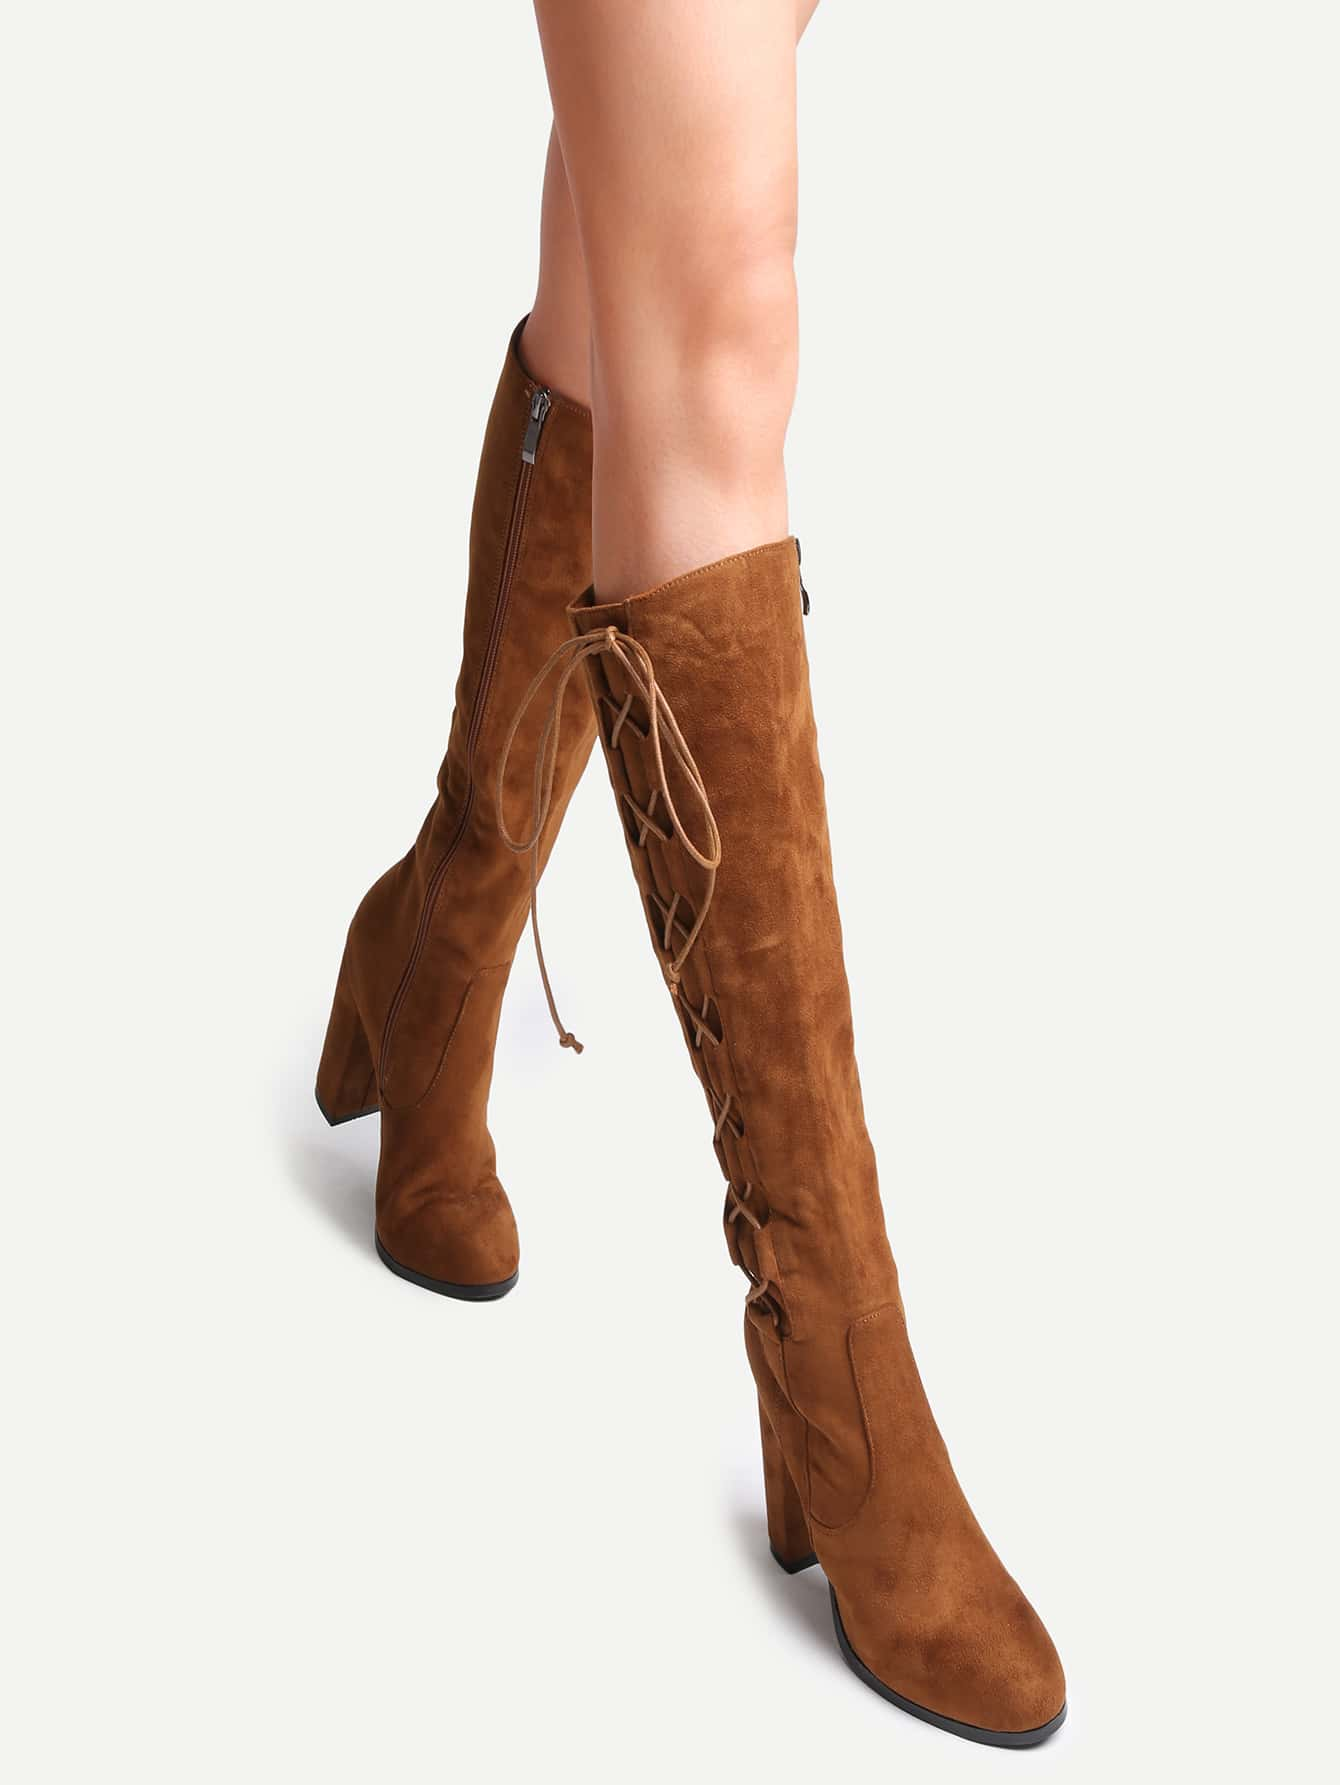 Camel Faux Suede Lace Up Side High Heel BootsCamel Faux Suede Lace Up Side High Heel Boots<br><br>color: Camel<br>size: EUR36,EUR37,EUR38,EUR39